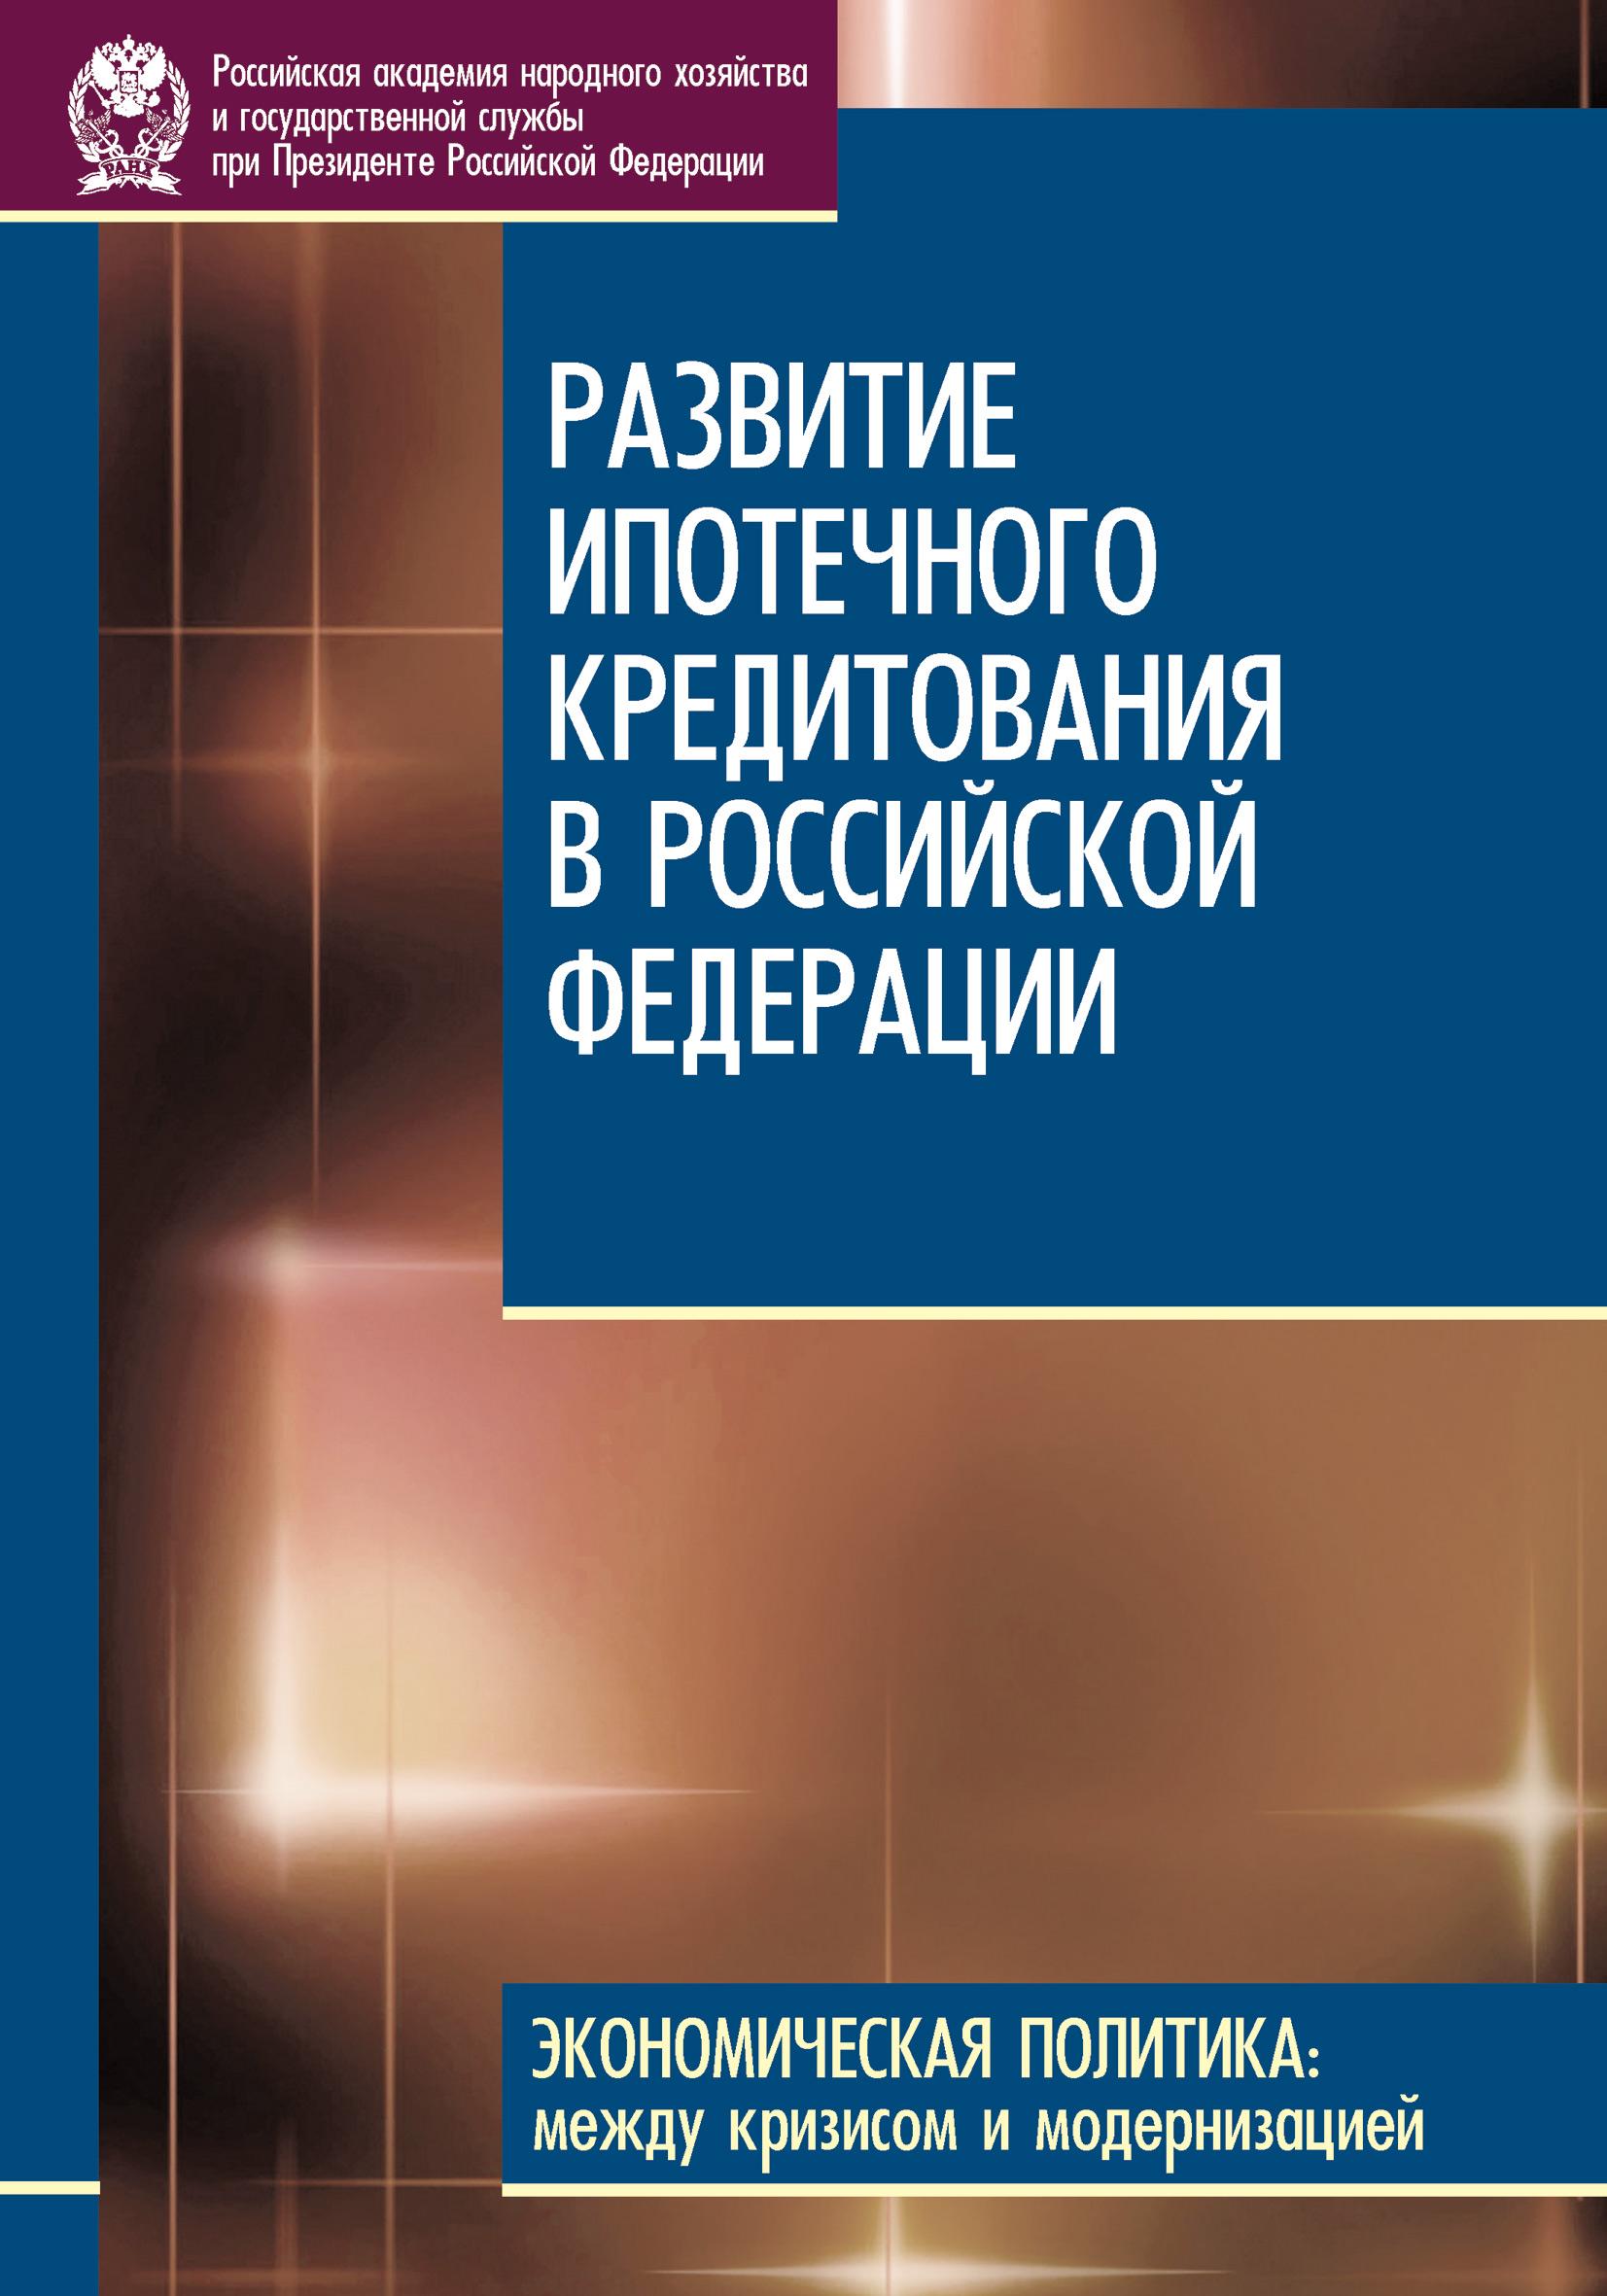 Обложка книги. Автор - Н. Косарева